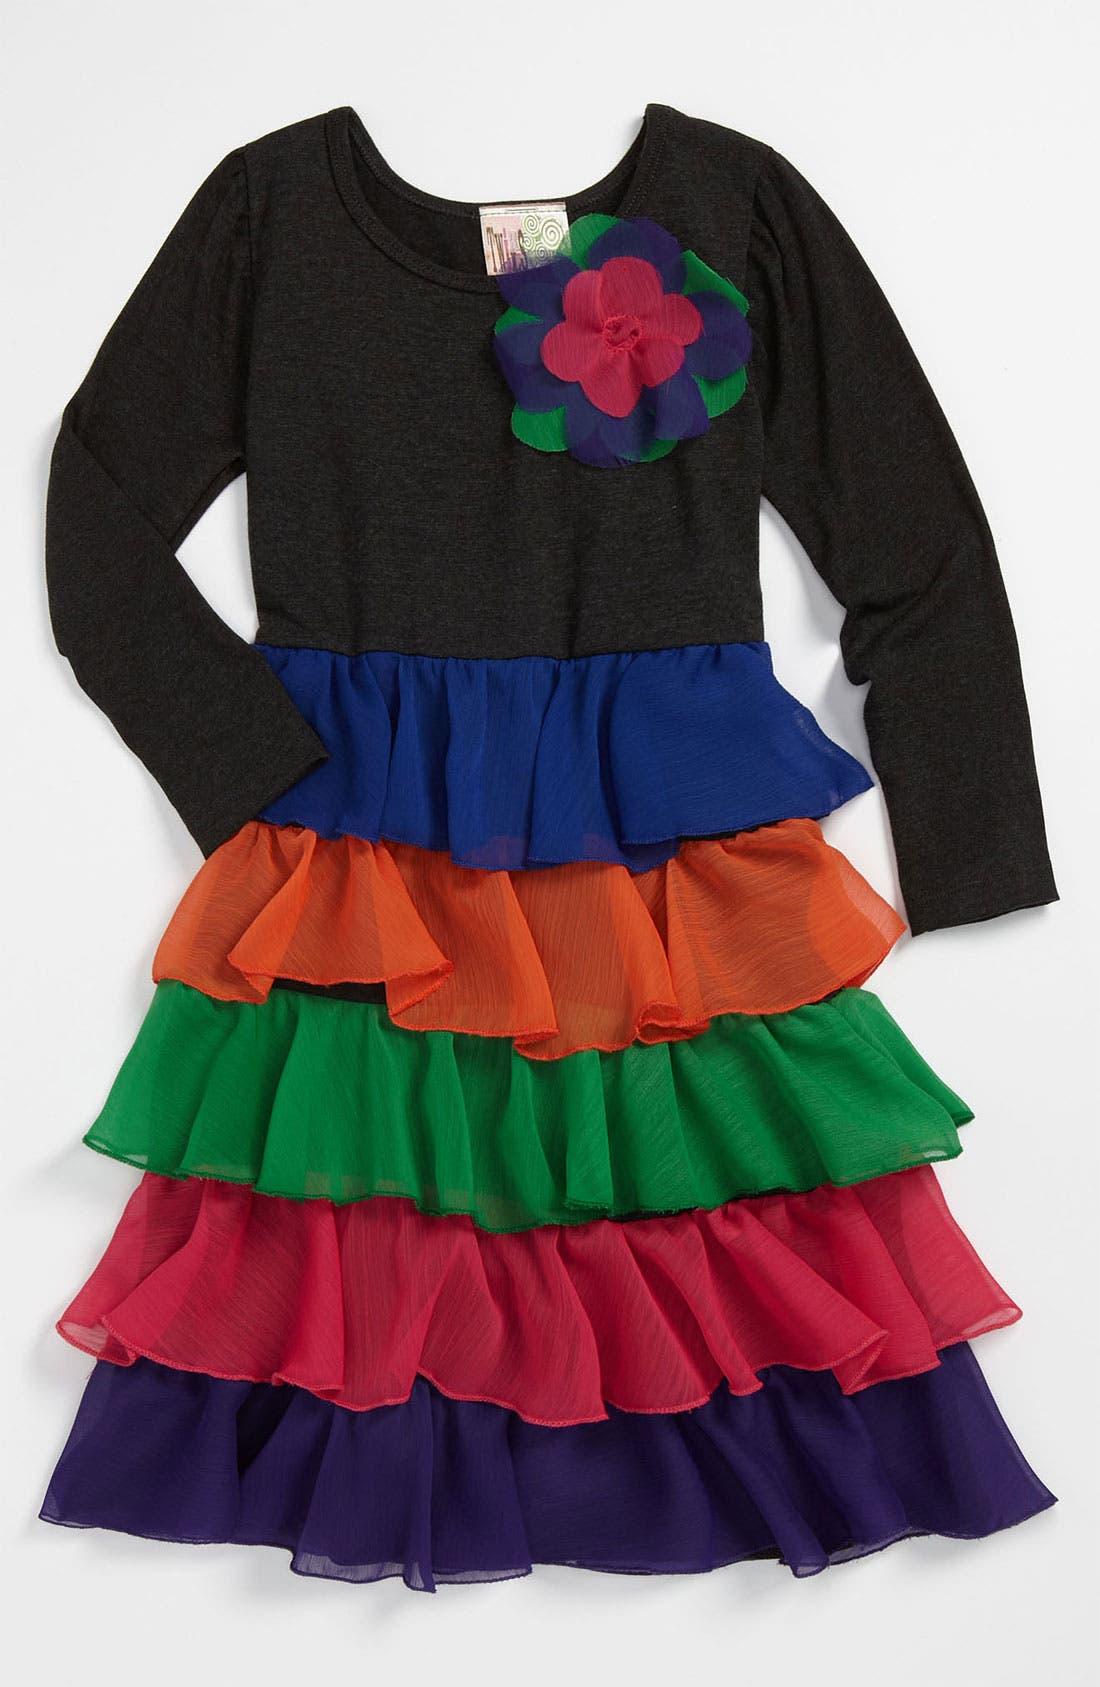 Alternate Image 1 Selected - Twirls & Twigs Tiered Dress (Little Girls)